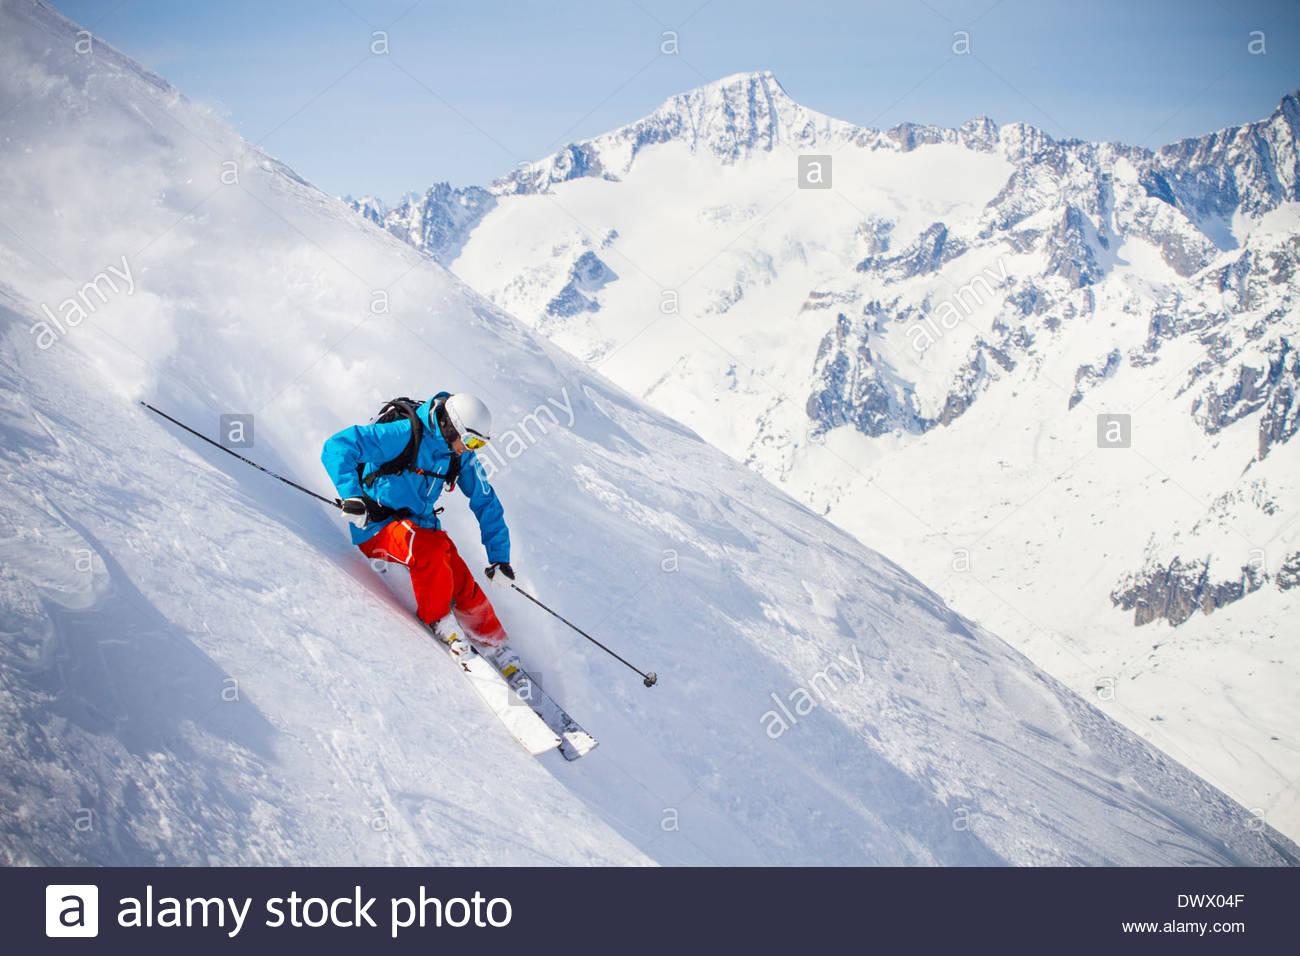 Full length of man skiing on mountain slope - Stock Image